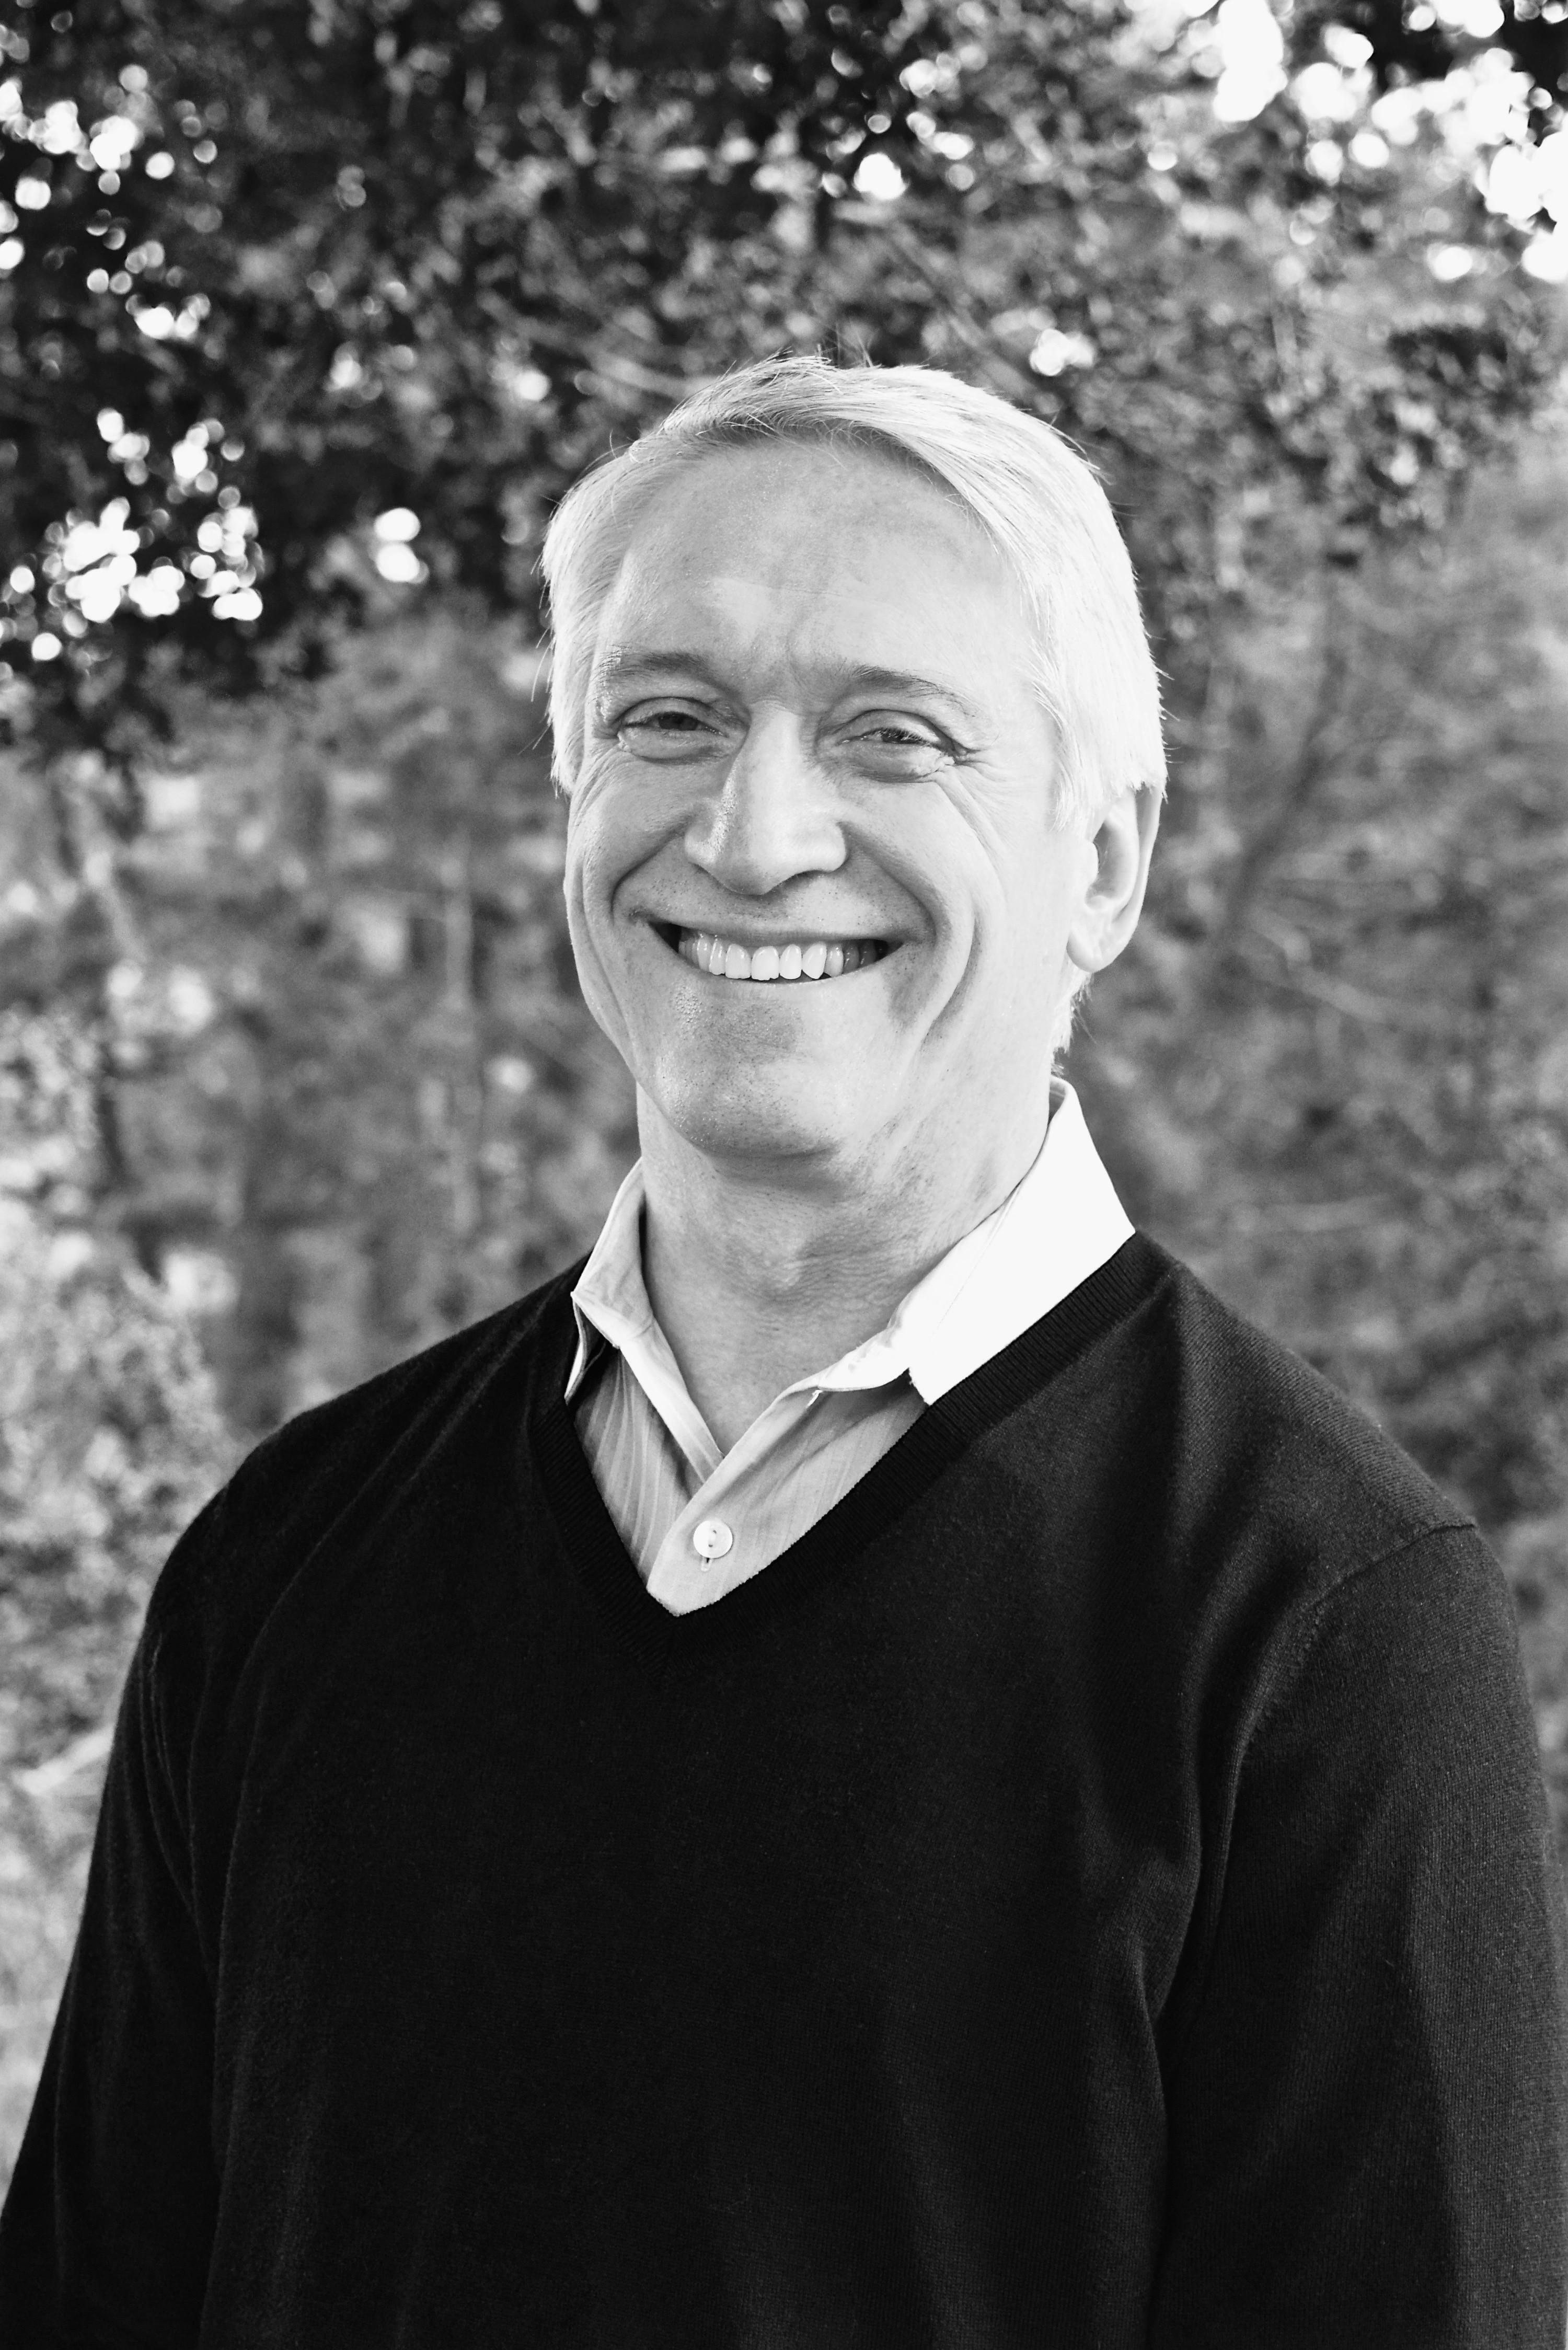 Prof. Stephen P. Hinshaw